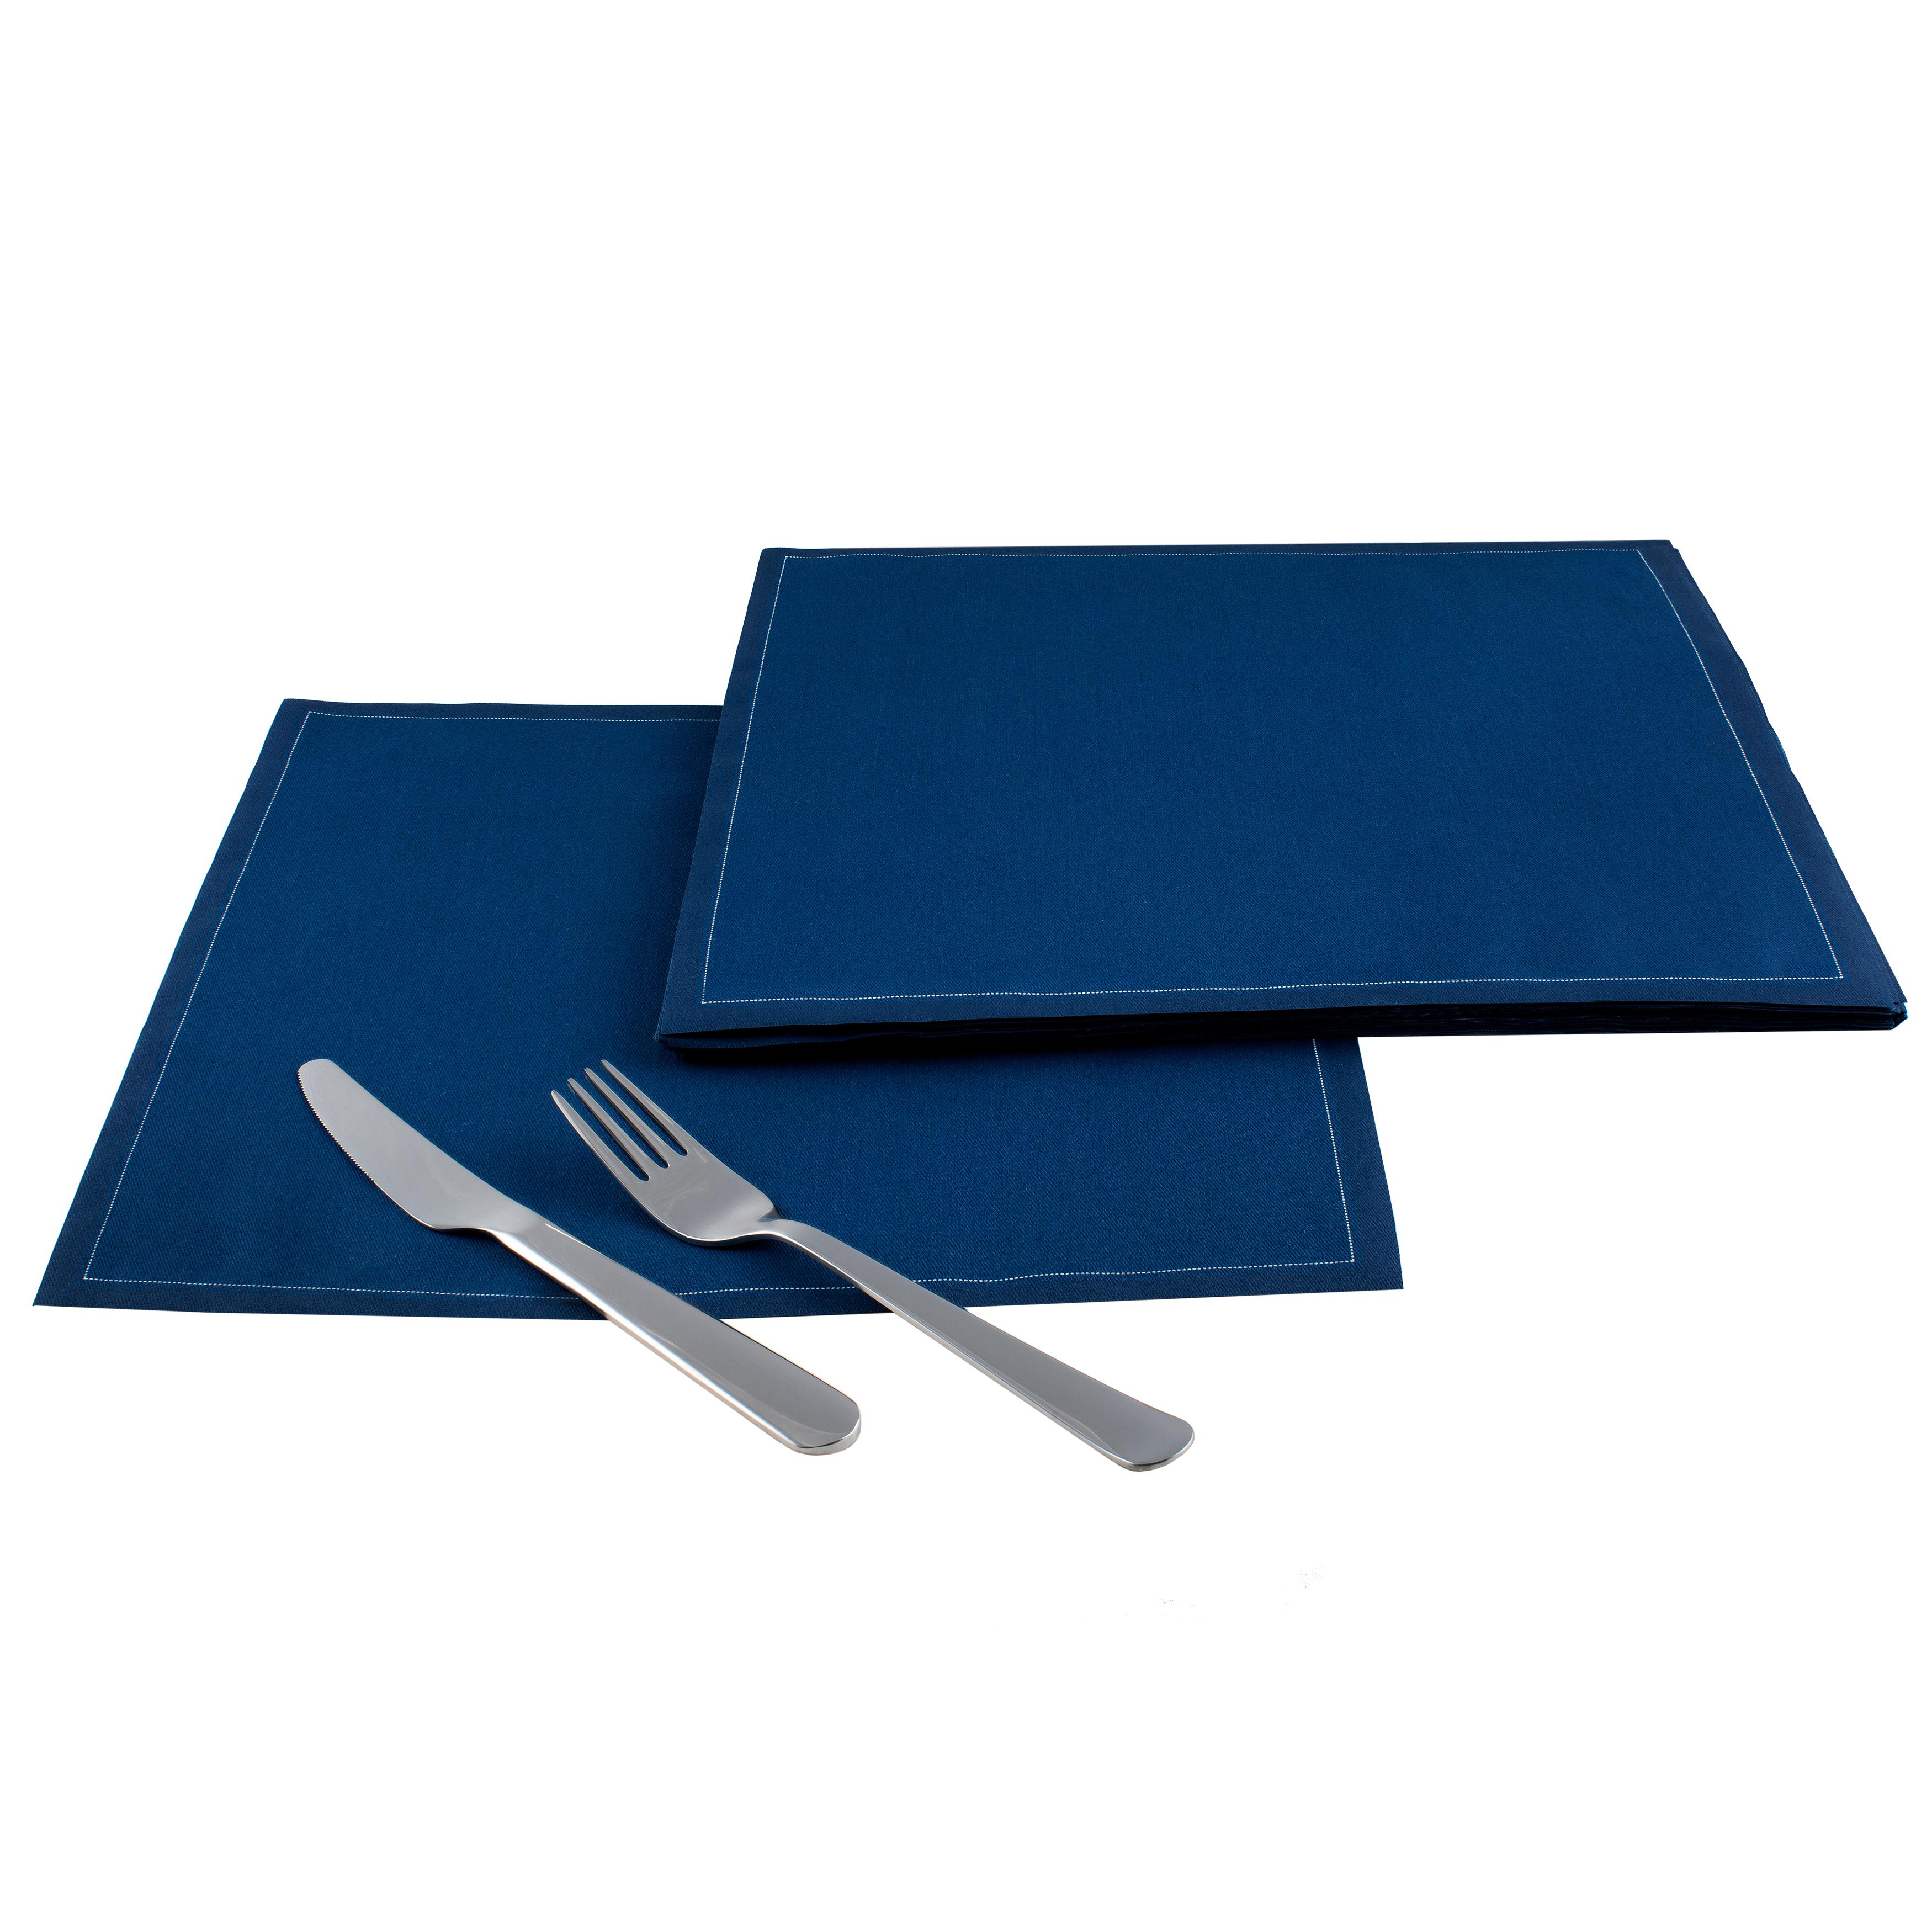 "Midnight Blue Cotton Dinner Napkins - 12.6"" x 12.6"" - 25 Units"